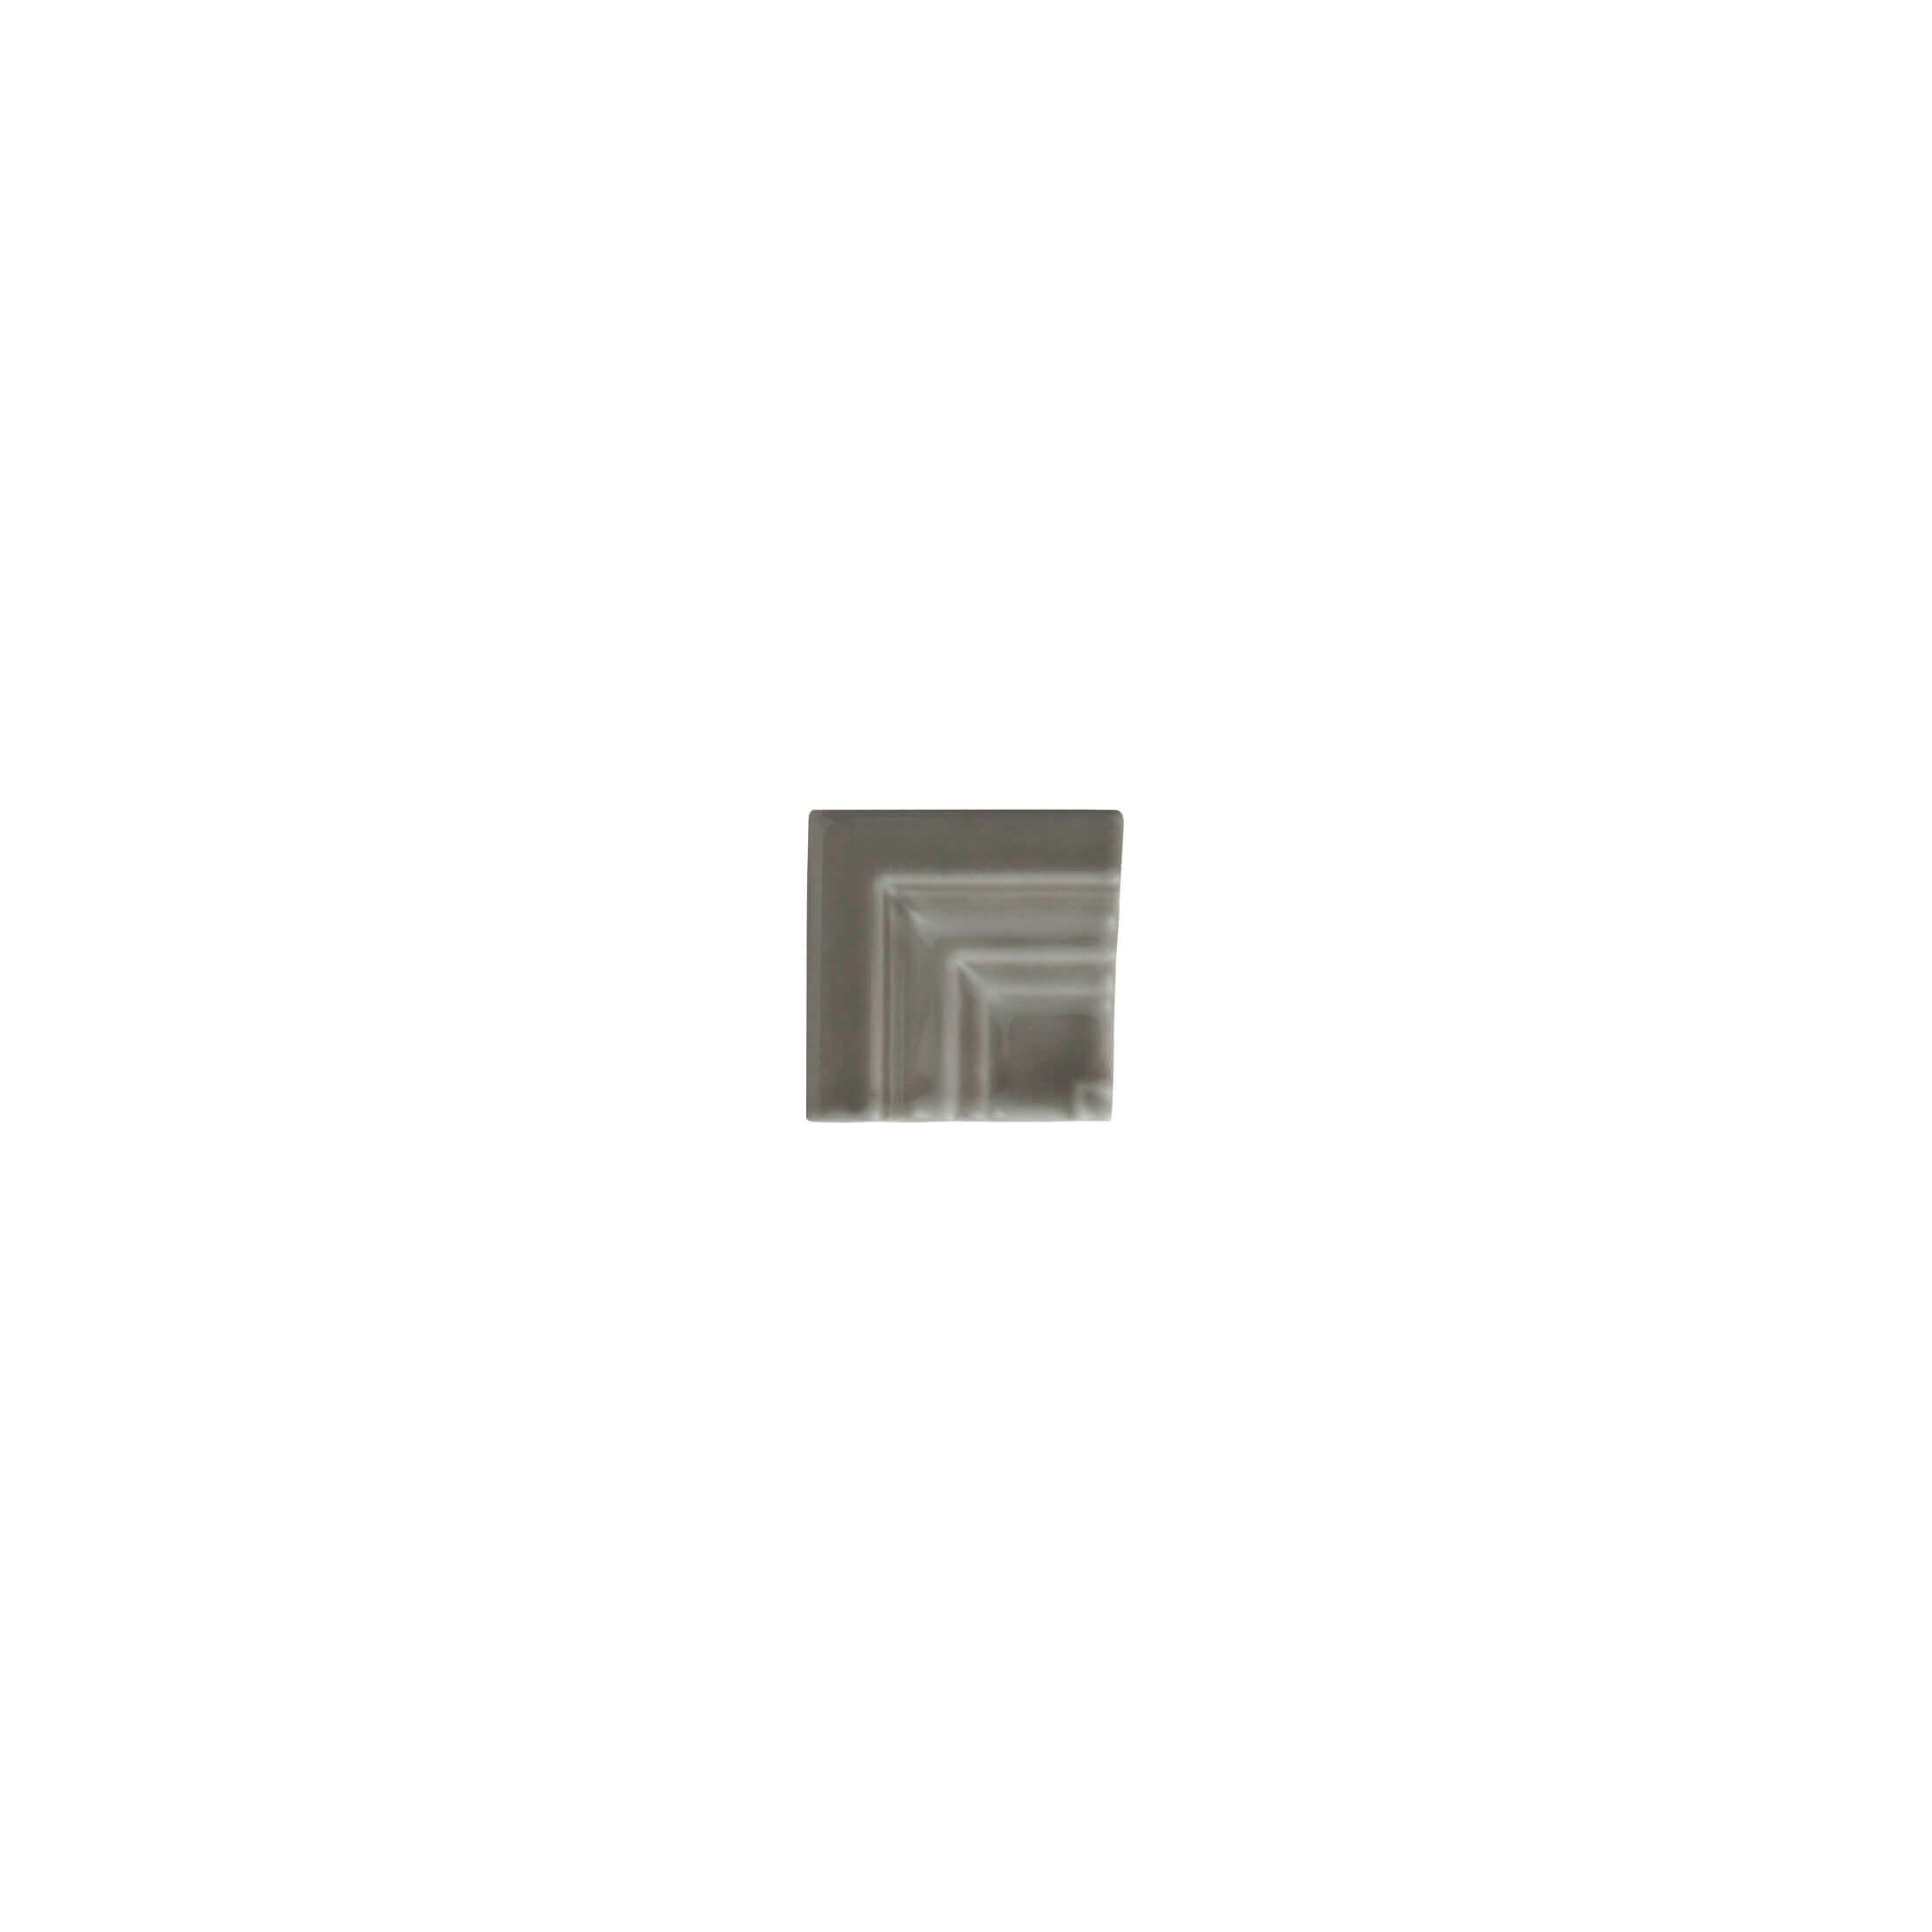 ADST5291 - ANGULO MARCO CORNISA - 5 cm X 19.8 cm